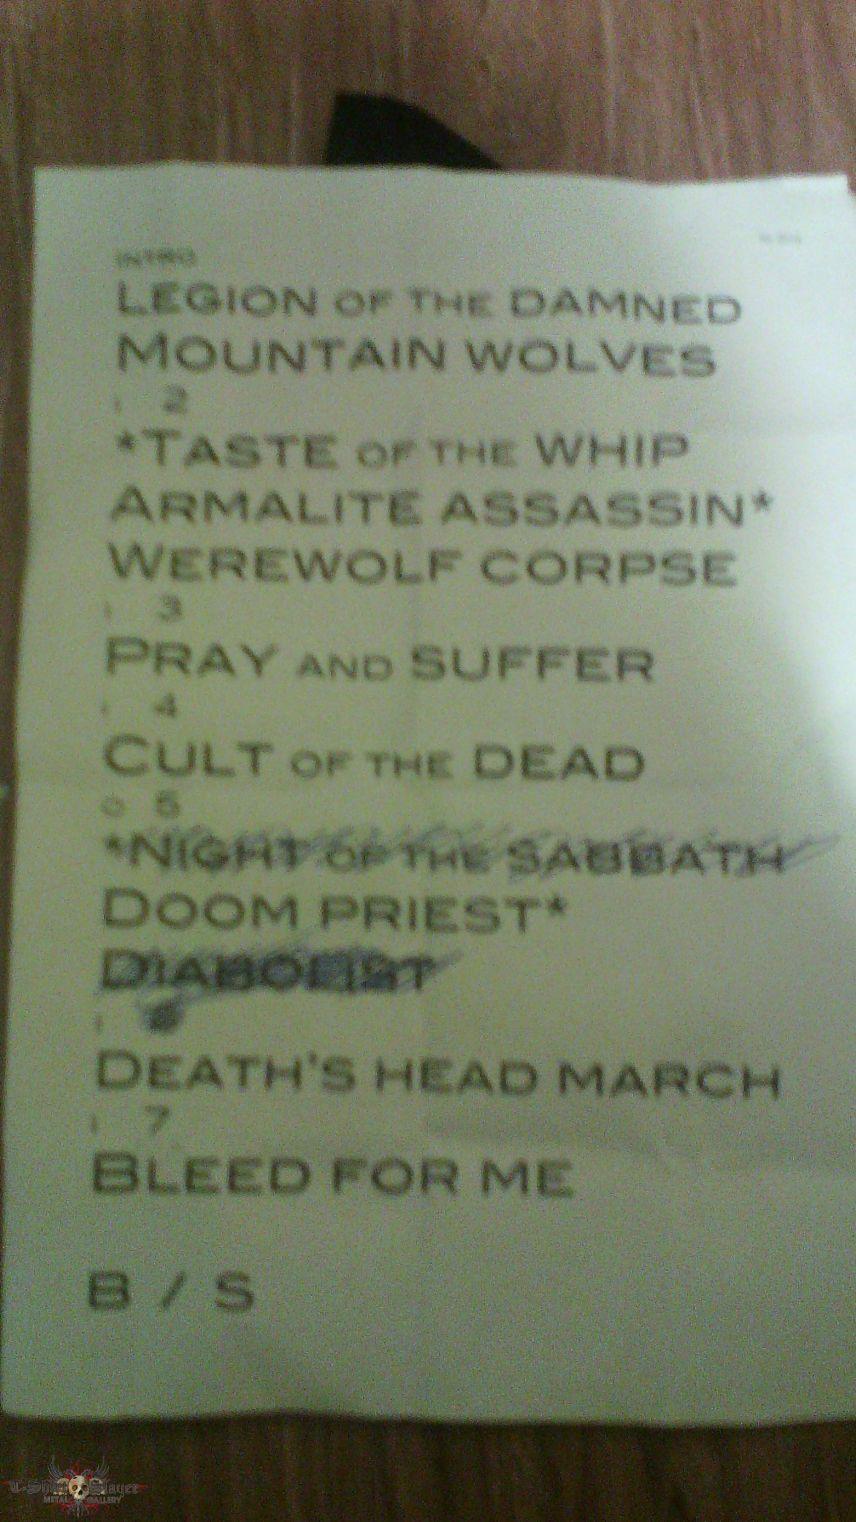 Legion of the Damned setlist